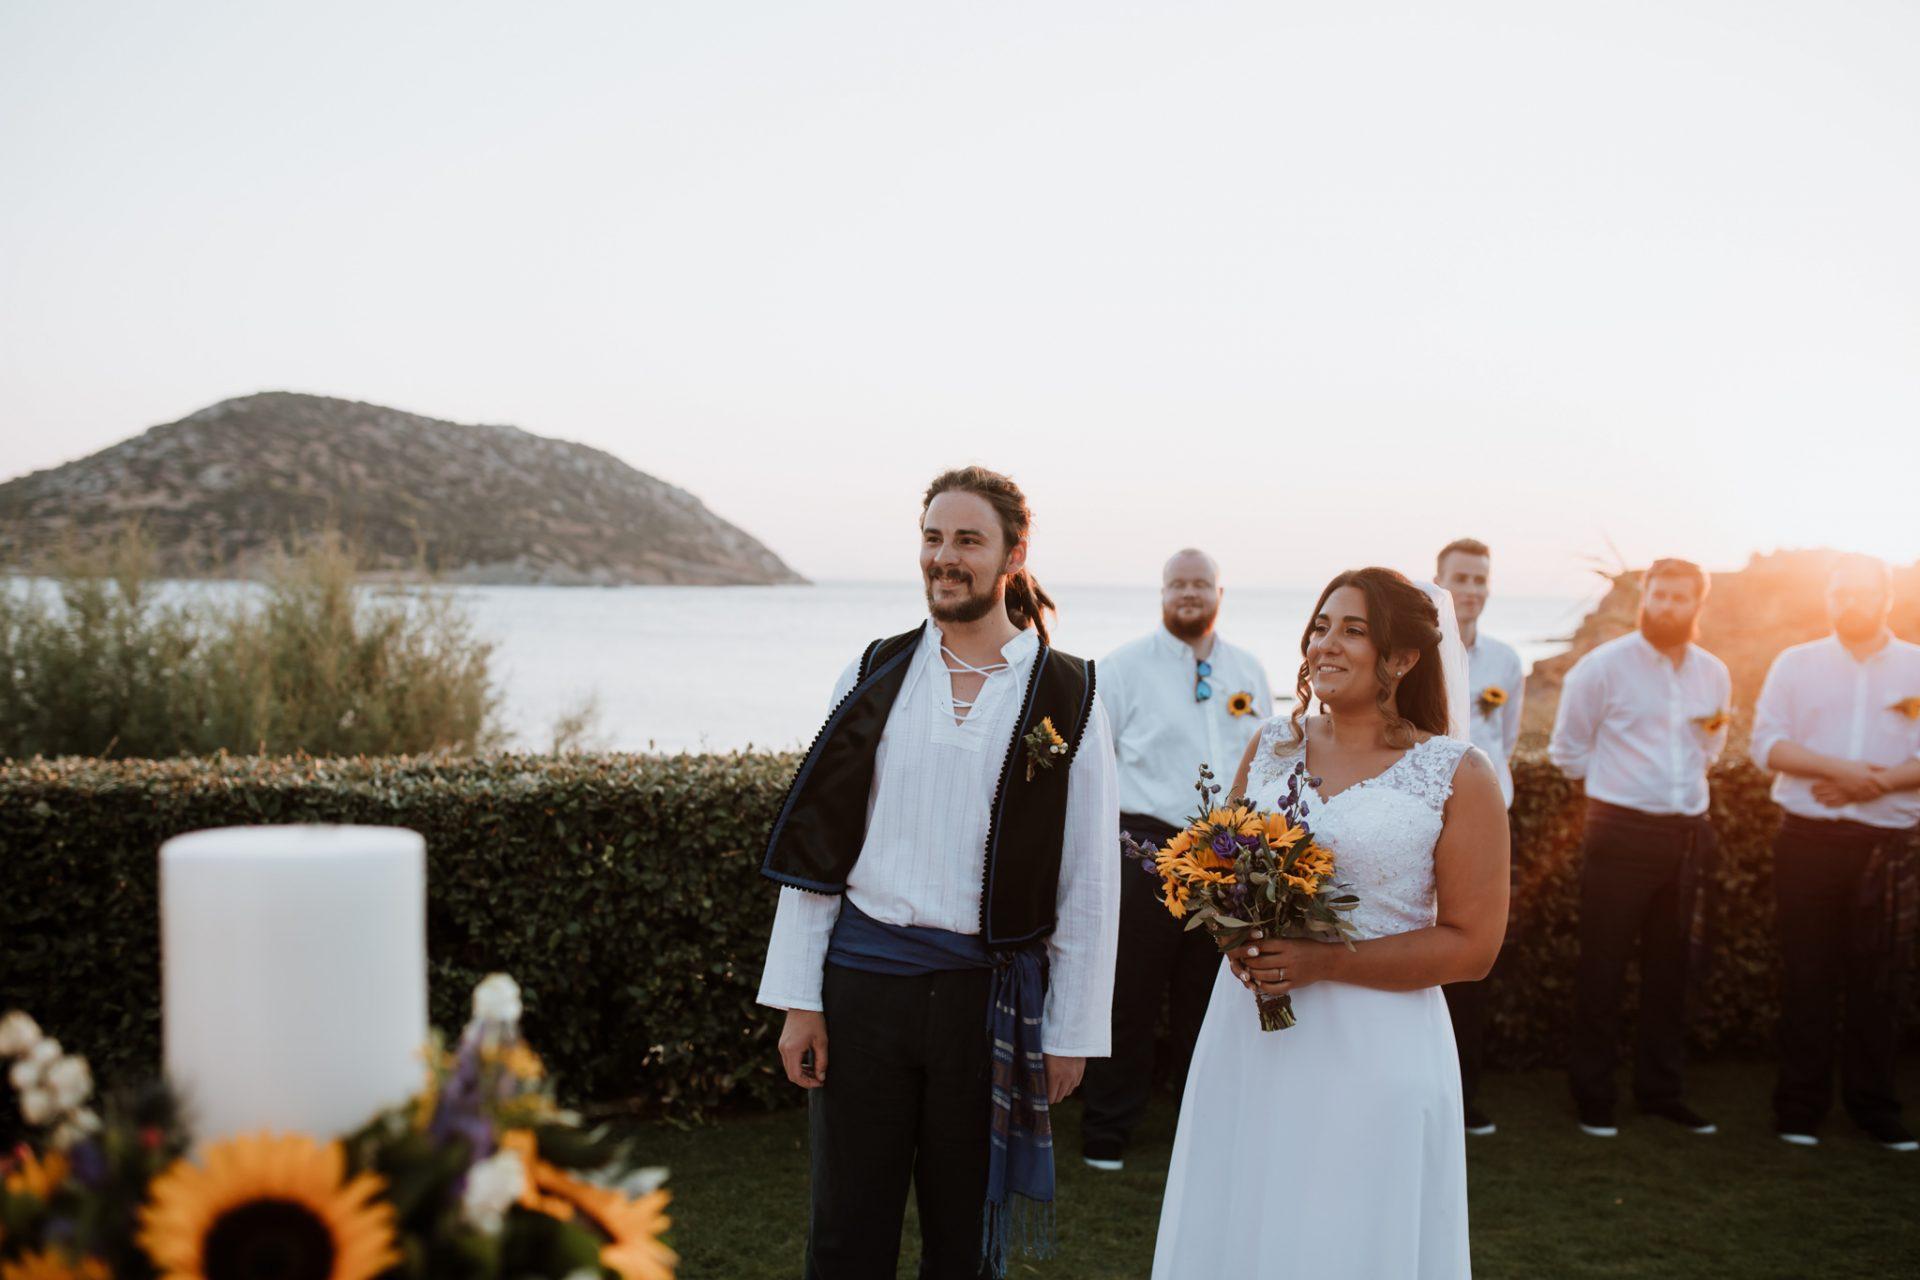 clifftop wedding ceremony greece